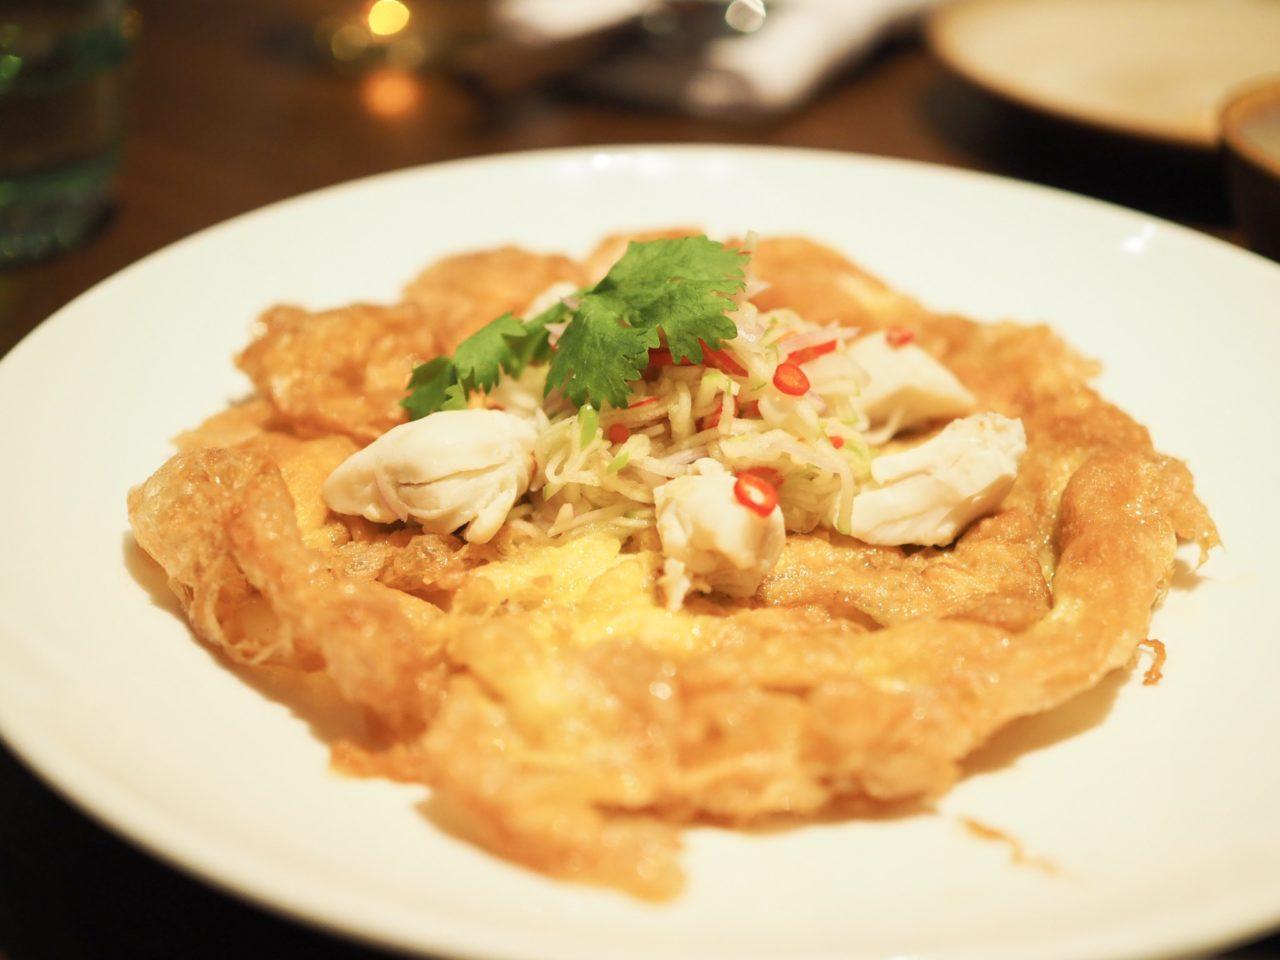 img 2943 - URBAN Cafe - スコータイ上海で味わう本場タイの味!期間限定メニューのご紹介